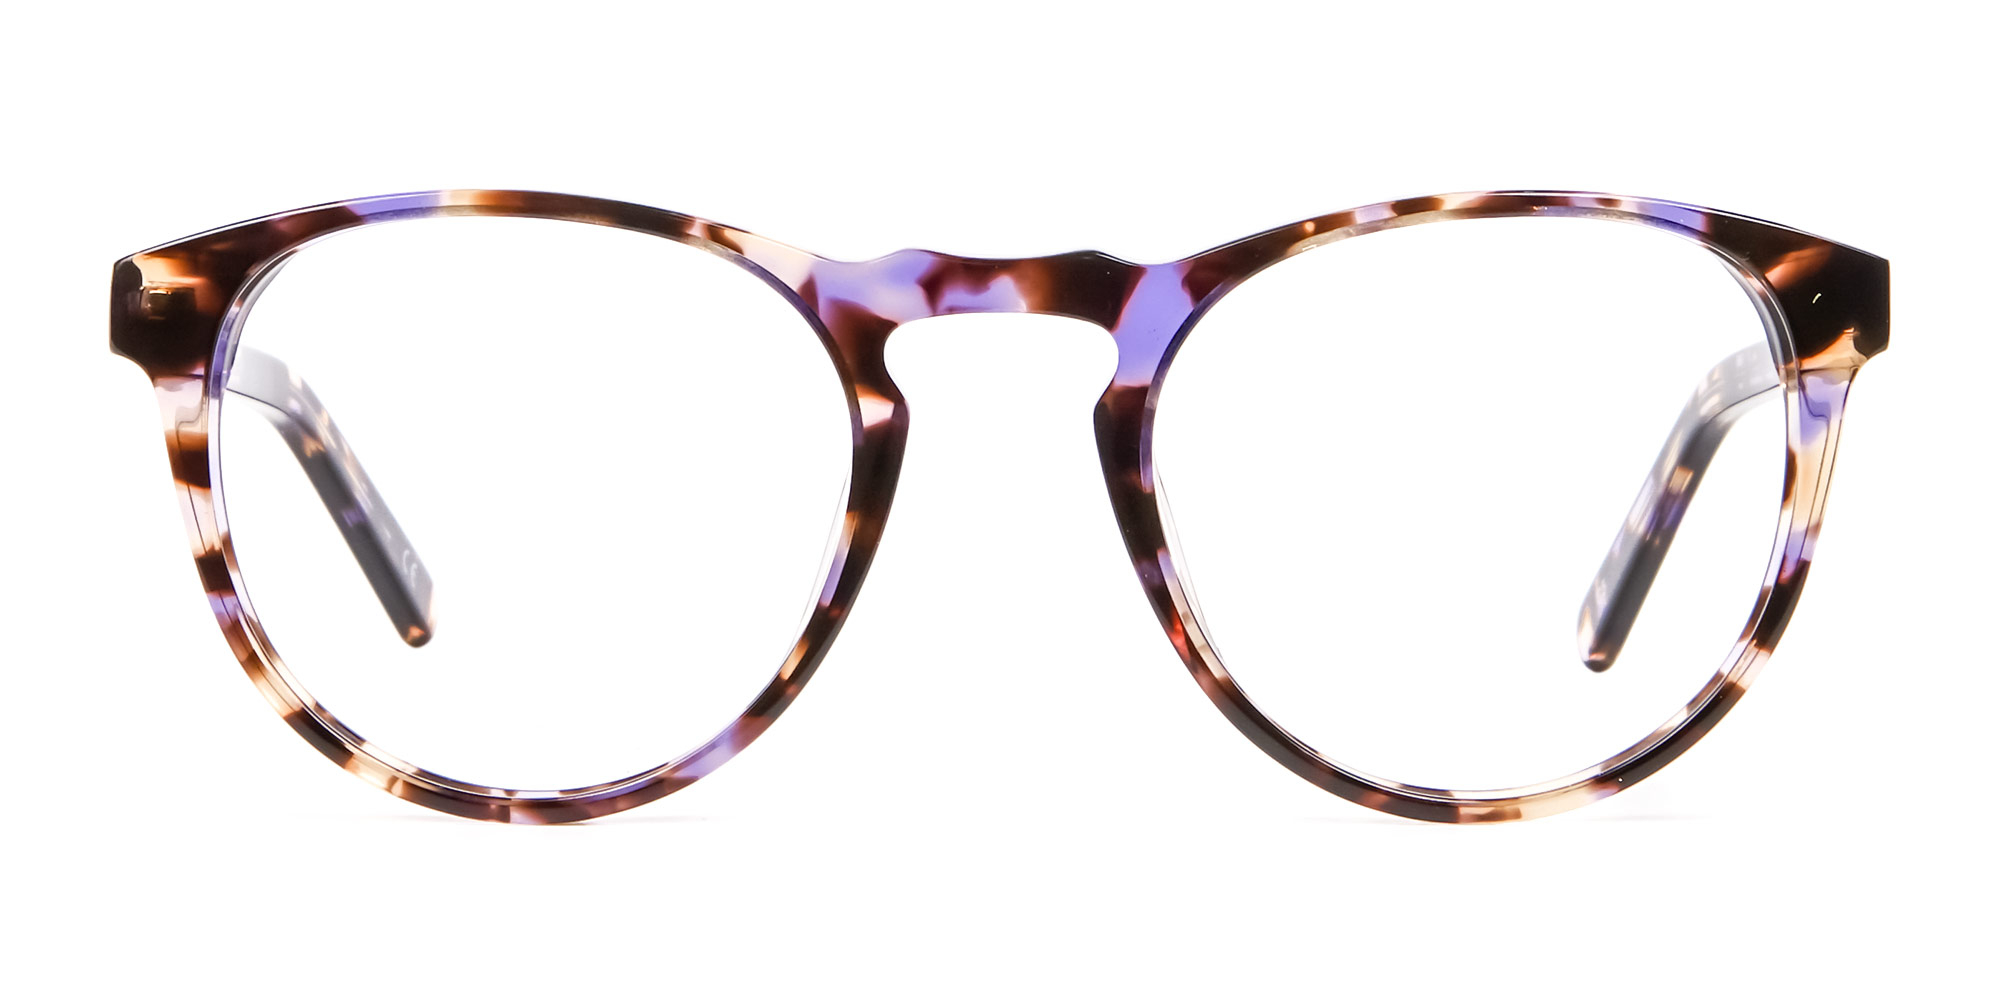 purple tortoiseshell glasses trends 2020